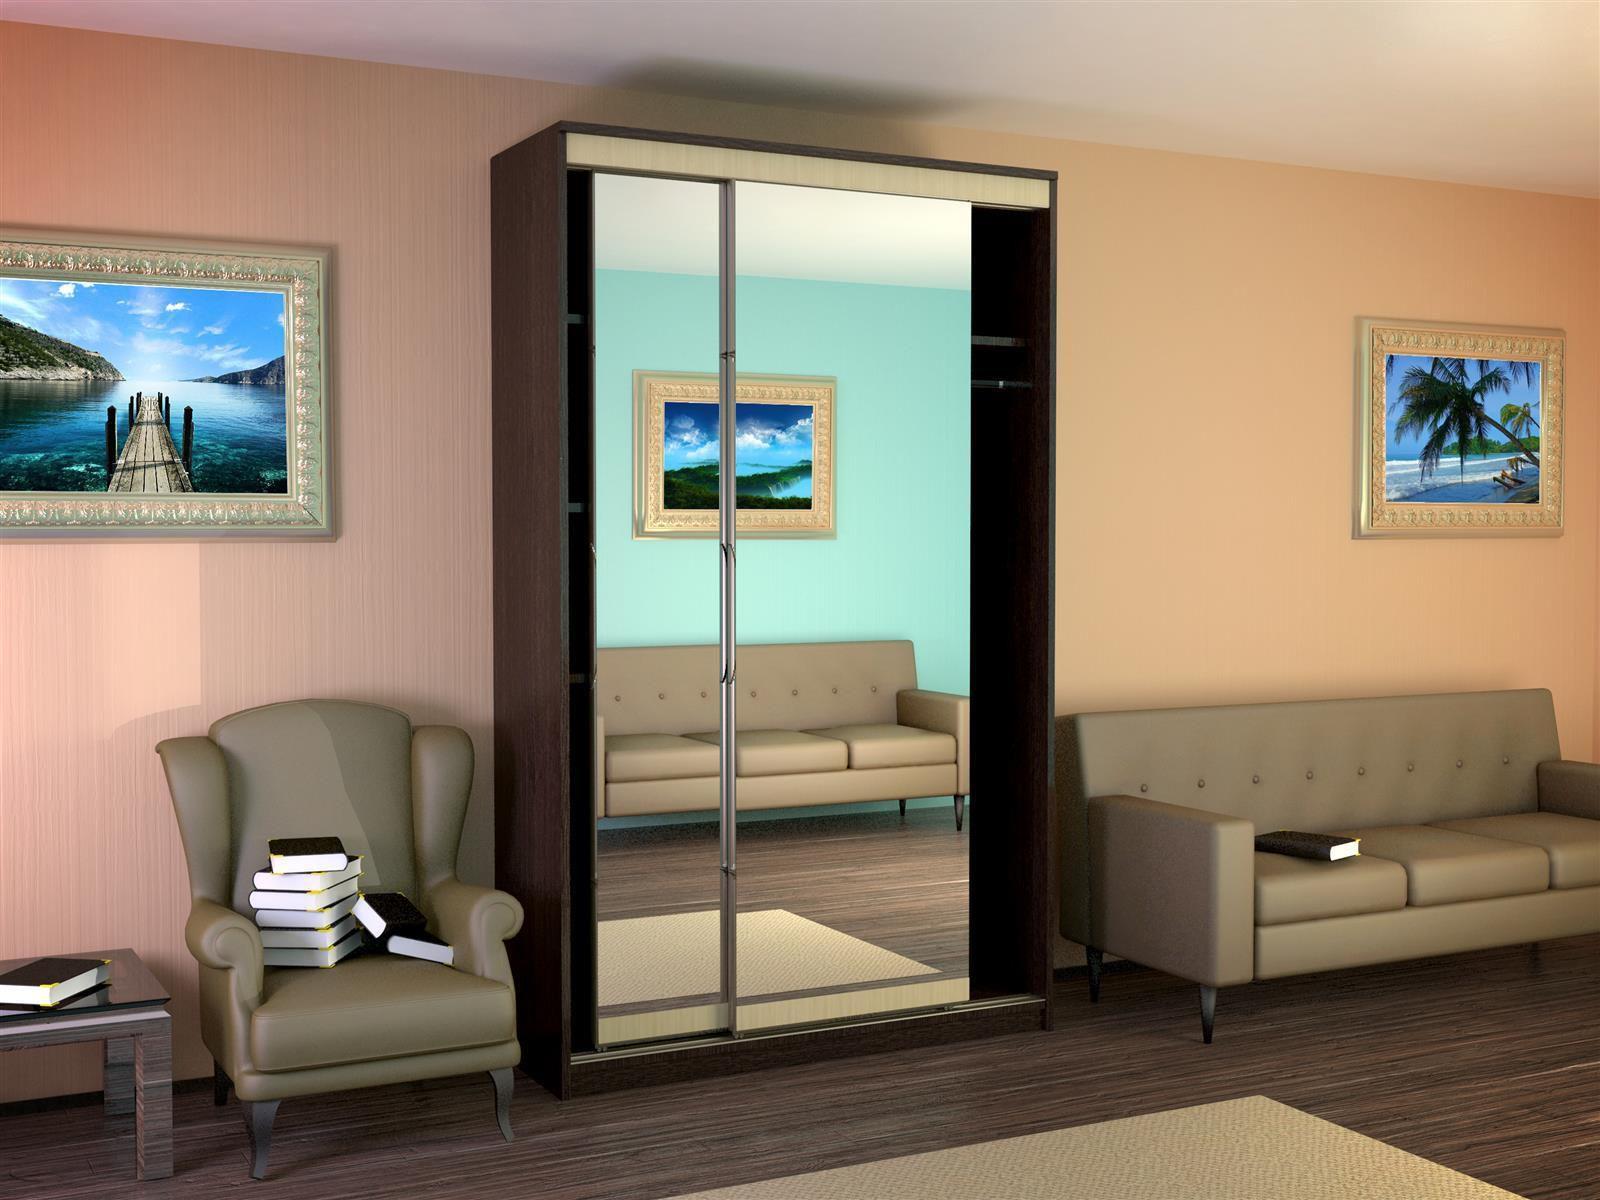 Шкаф-купе 2-х дверный с 2-я зеркалами (рамир).